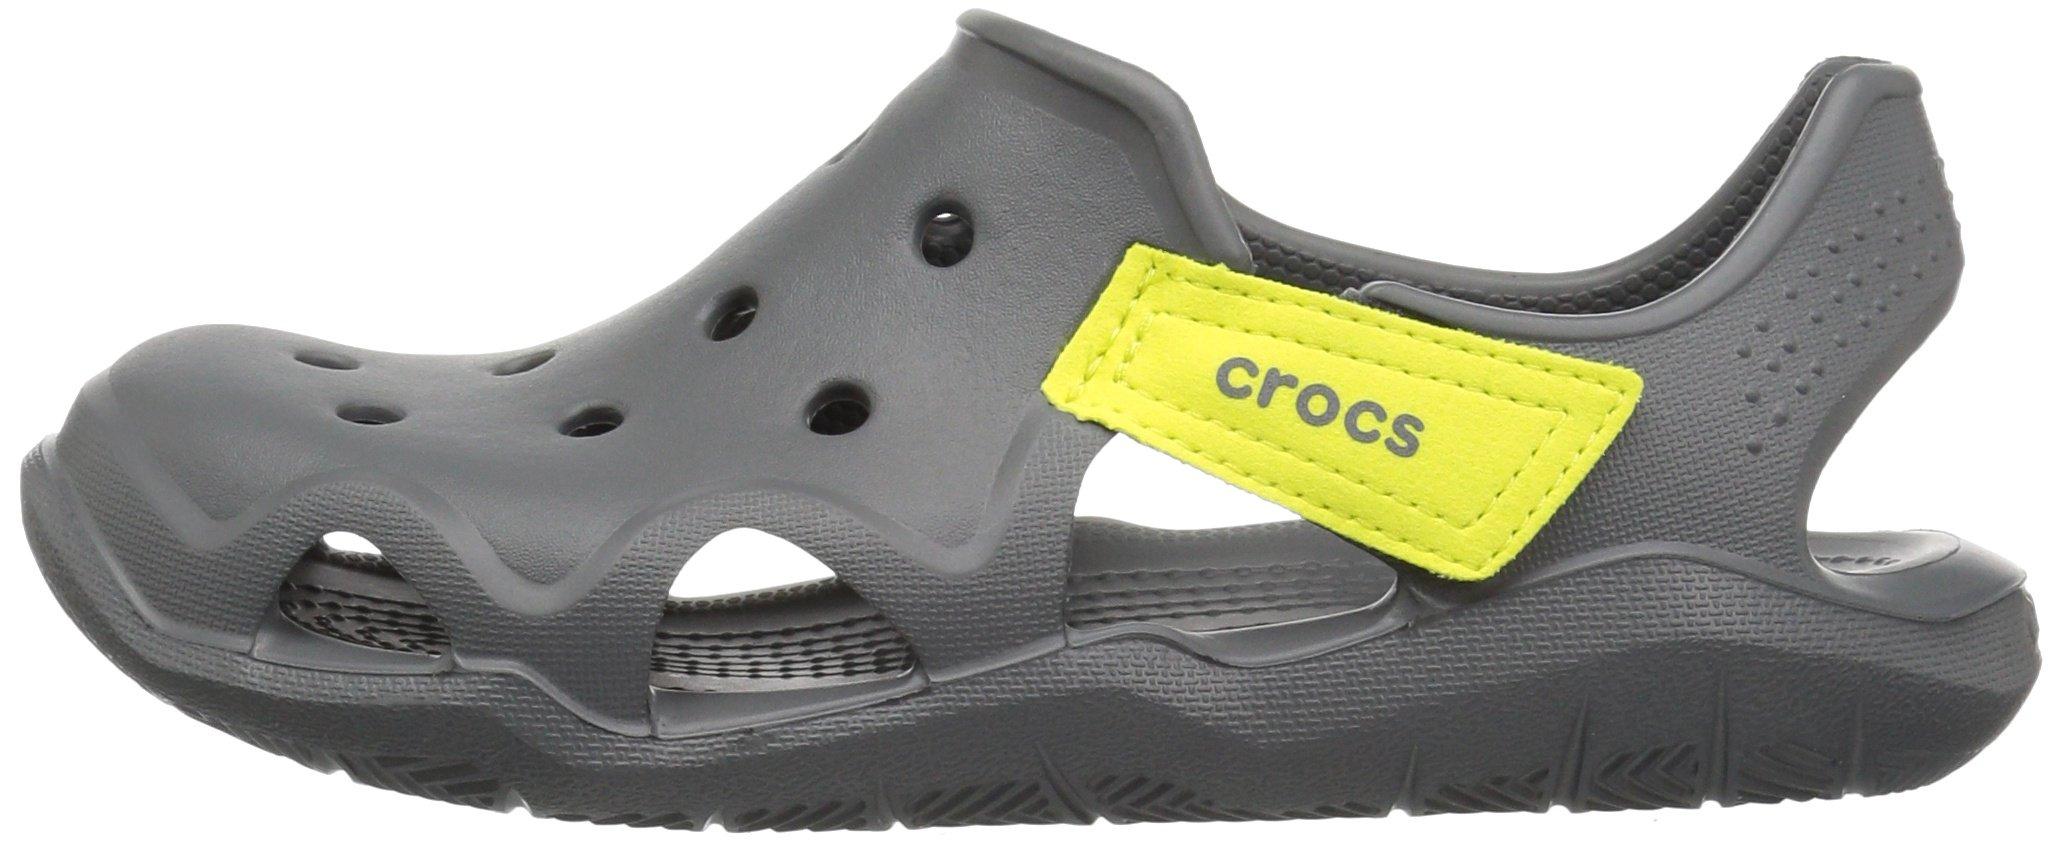 Crocs Unisex-Kids Swiftwater Wave Flat Sandal, Slate Grey/Tennis Ball Green, 13 M US Little Kid by Crocs (Image #5)